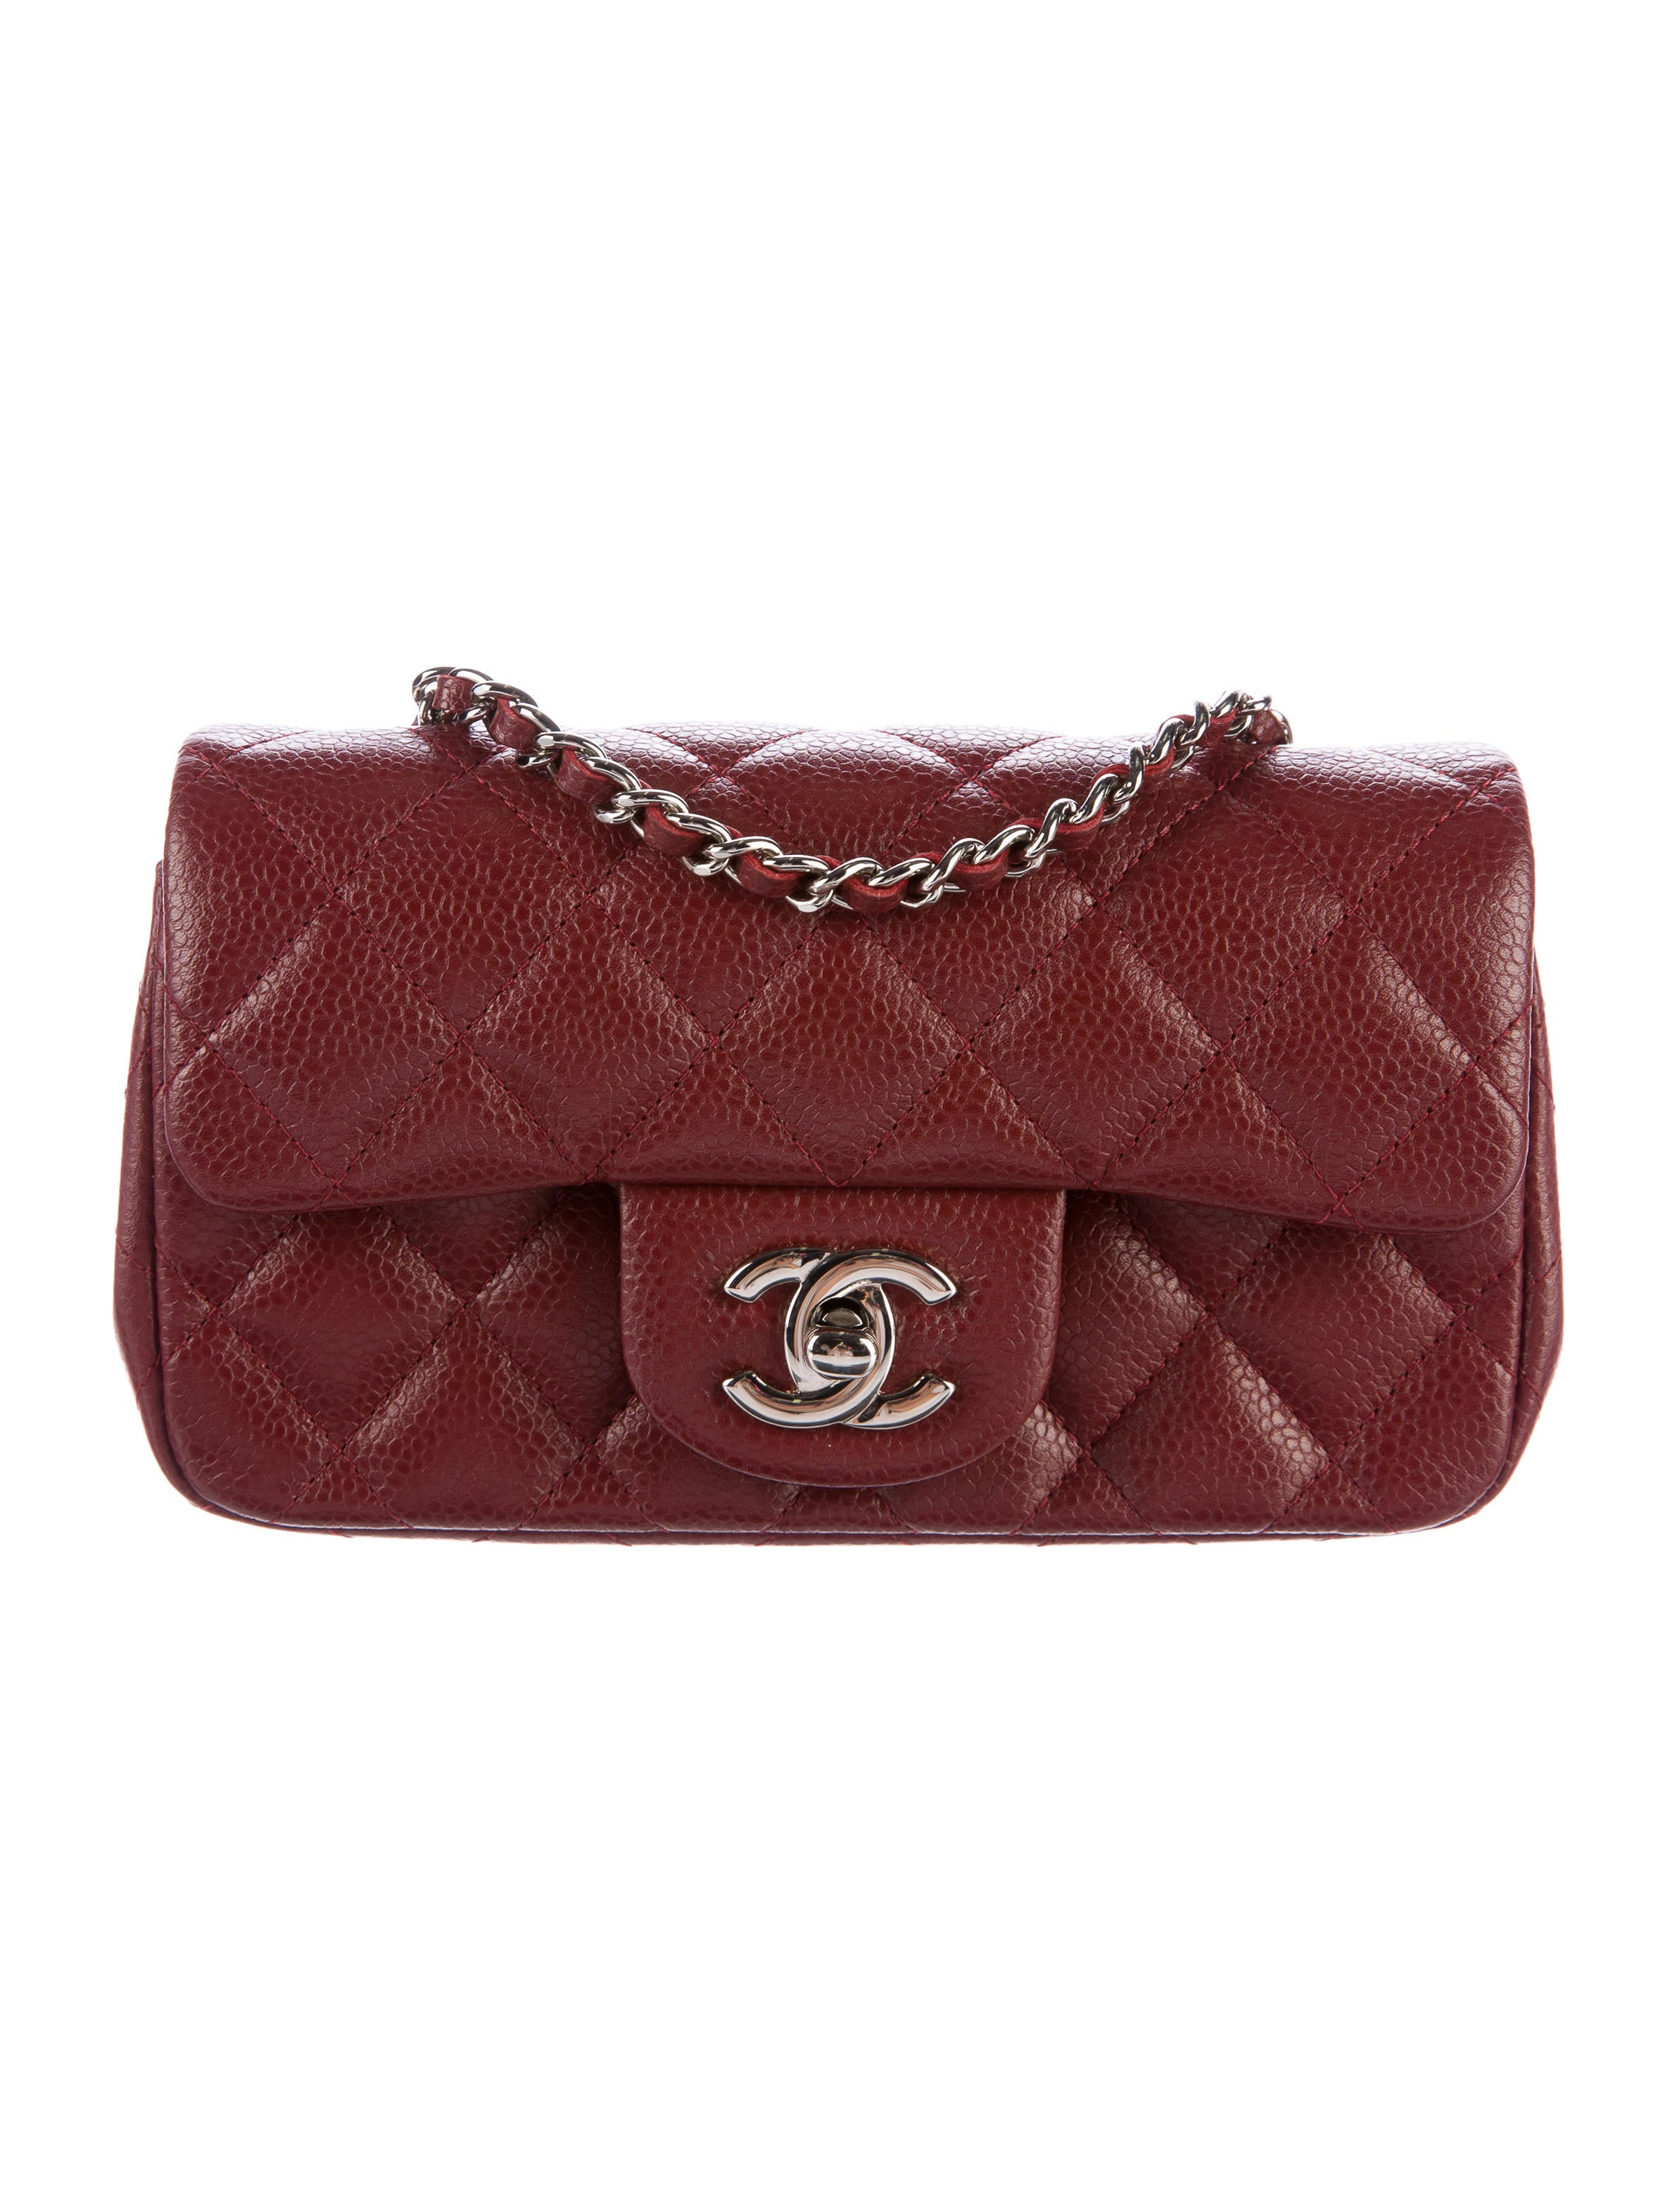 424b95adb41f Chanel Classic Extra Mini Flap Bag - Handbags - CHA170470 | The RealReal